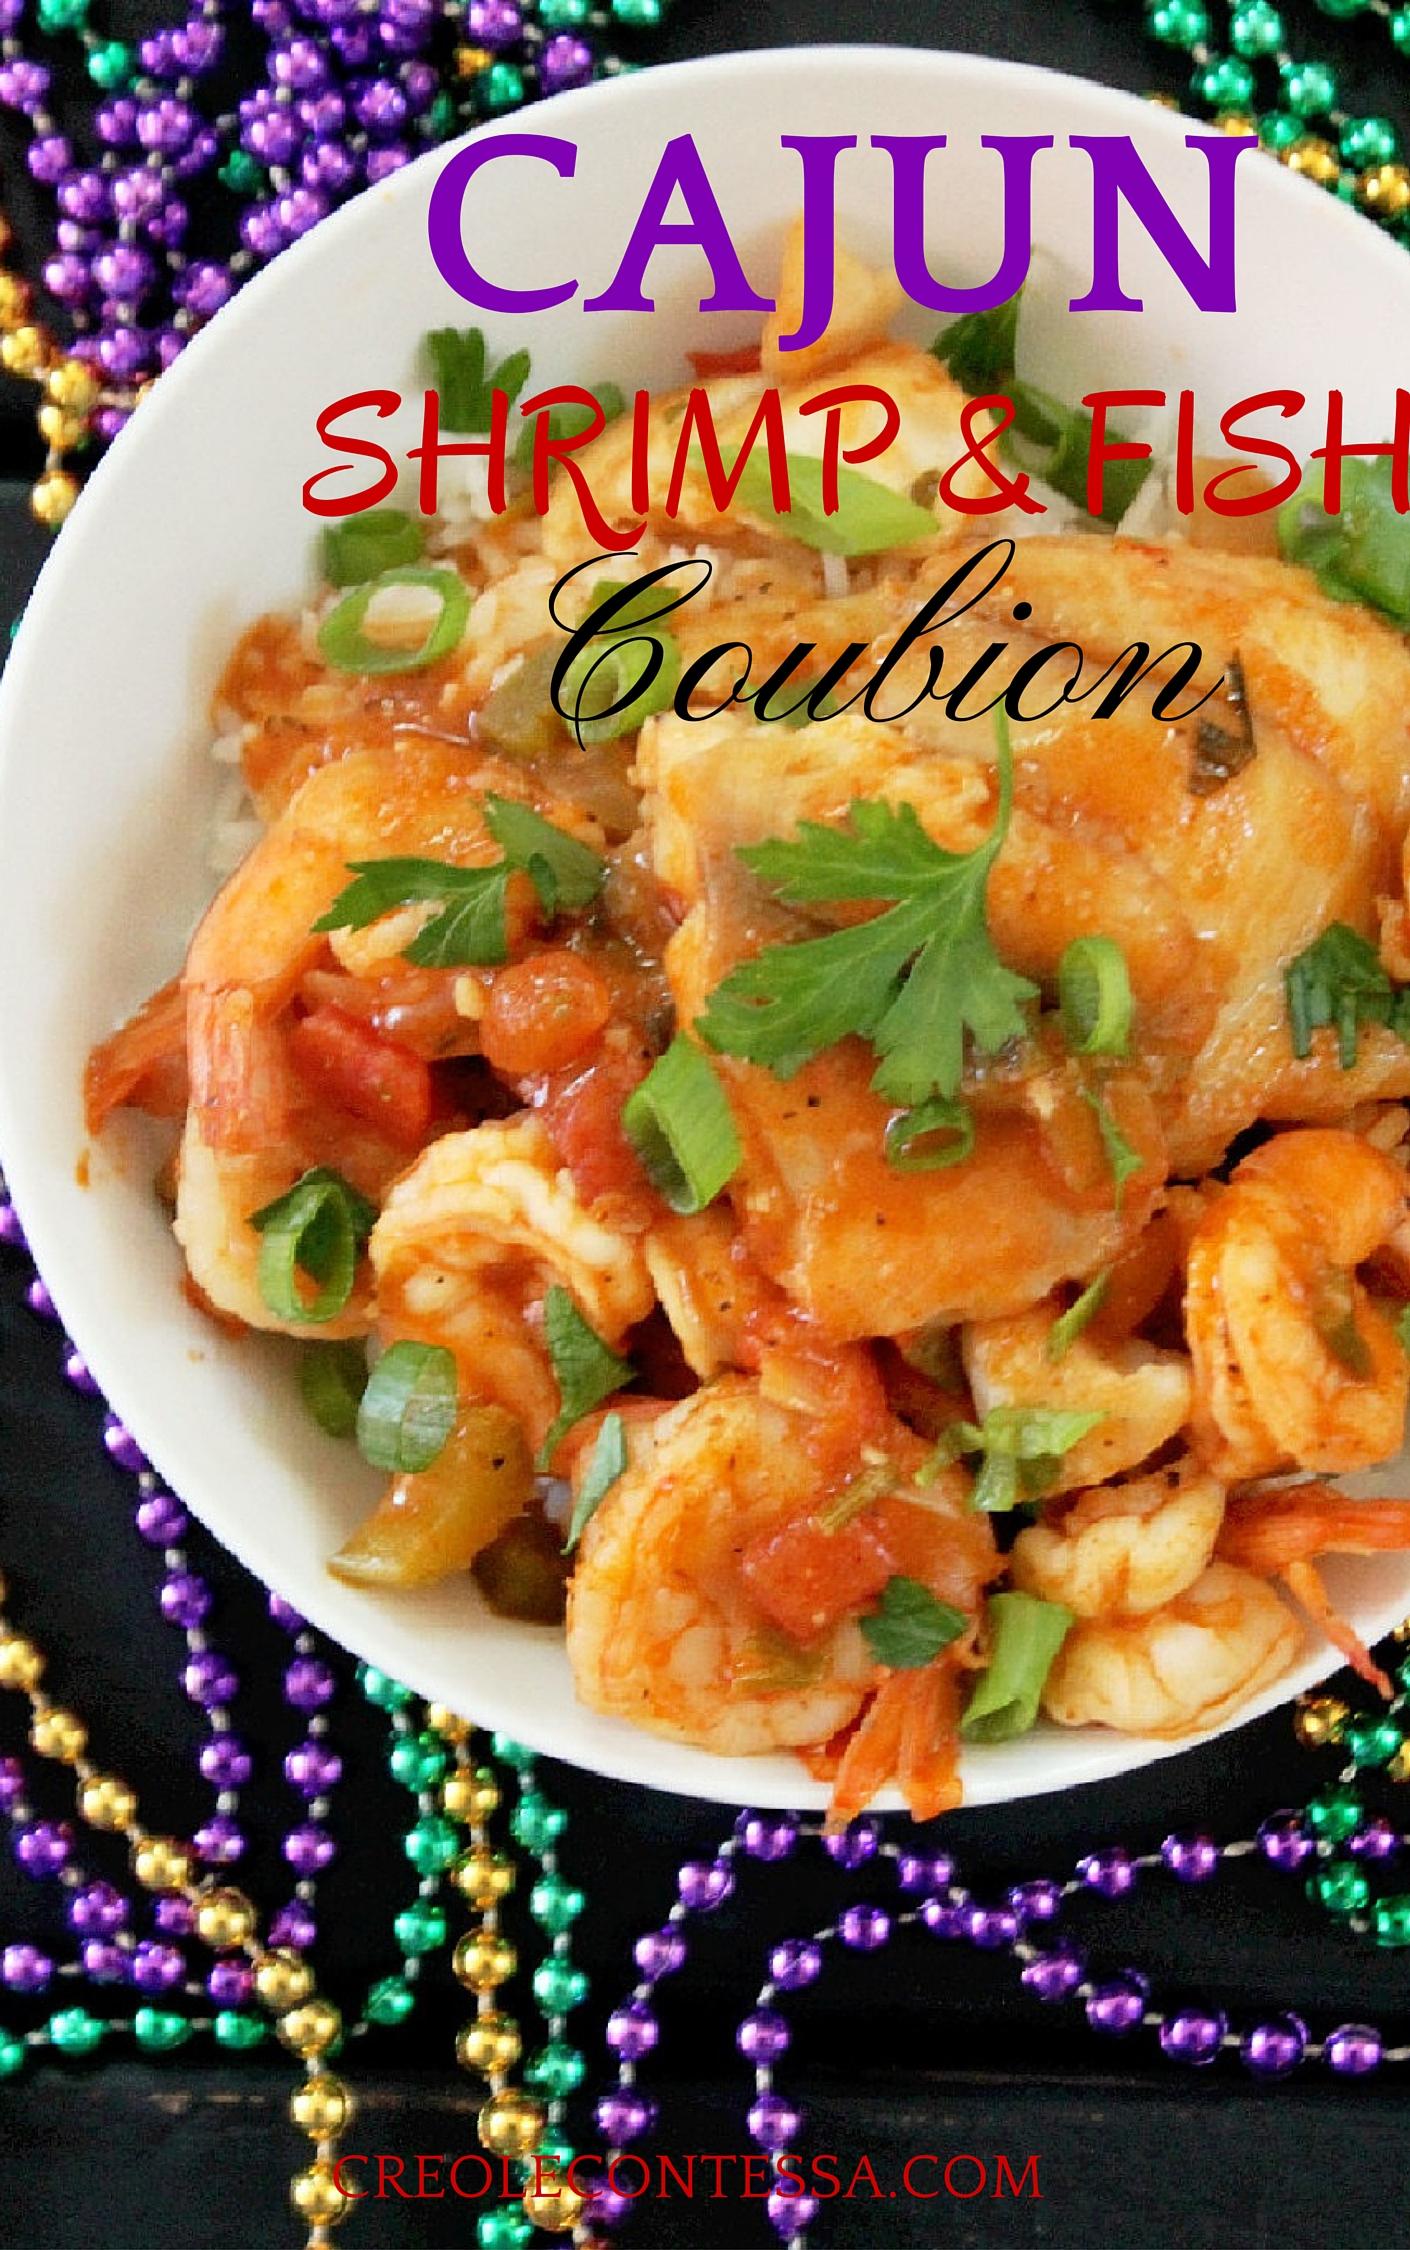 Cajun Shrimp Coubion with Fish-Creole Contessa